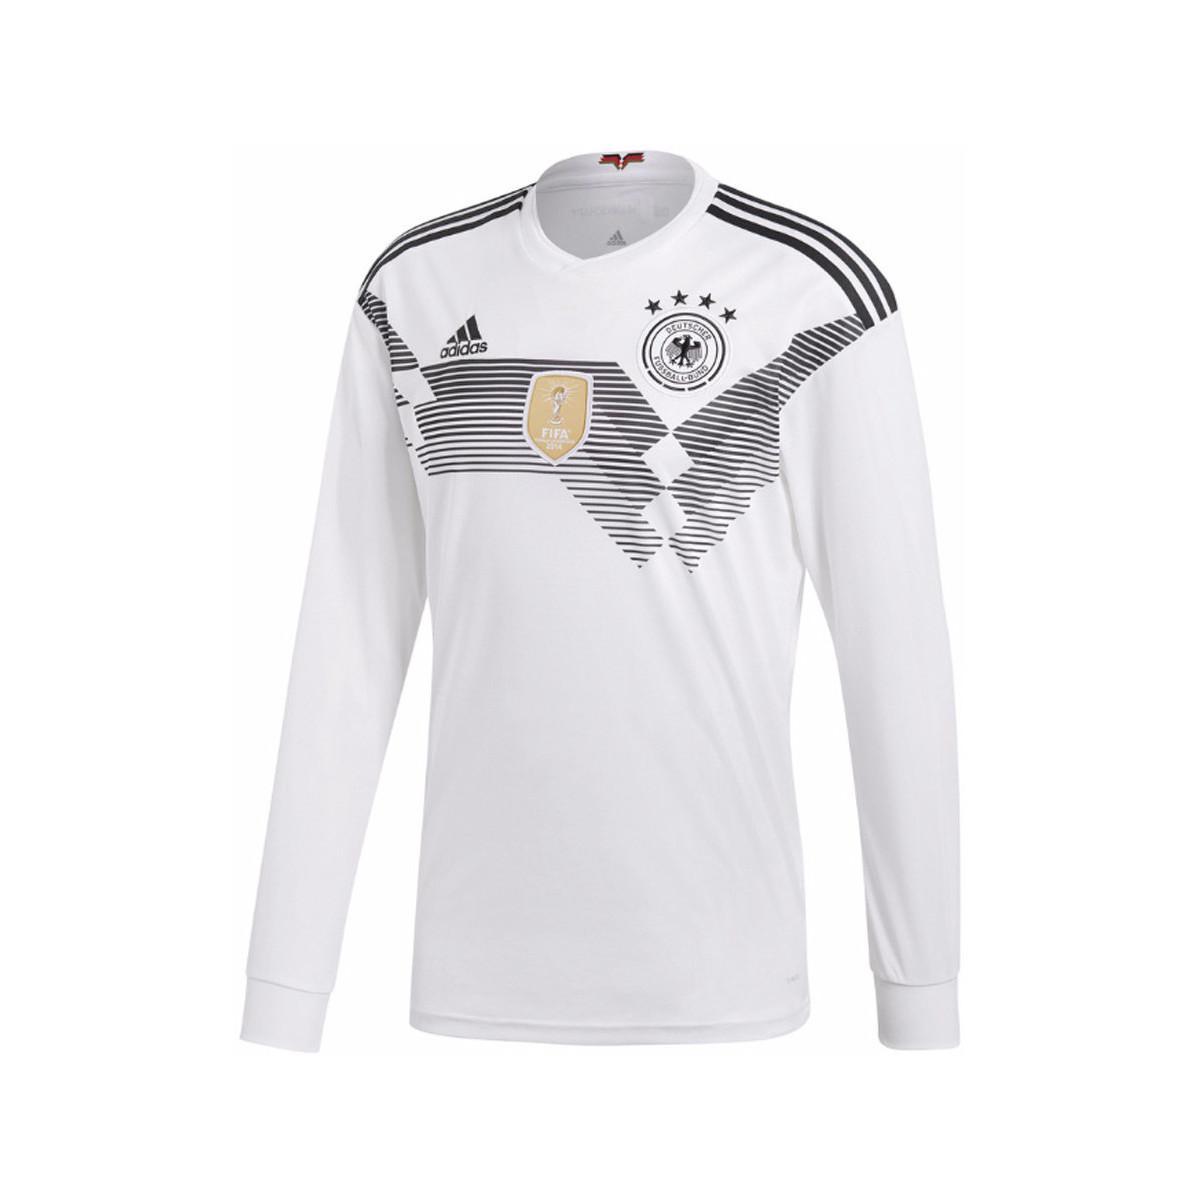 b1146f906 adidas 2018-19 Germany Home Long Sleeve Shirt (gotze 19) Men s In ...